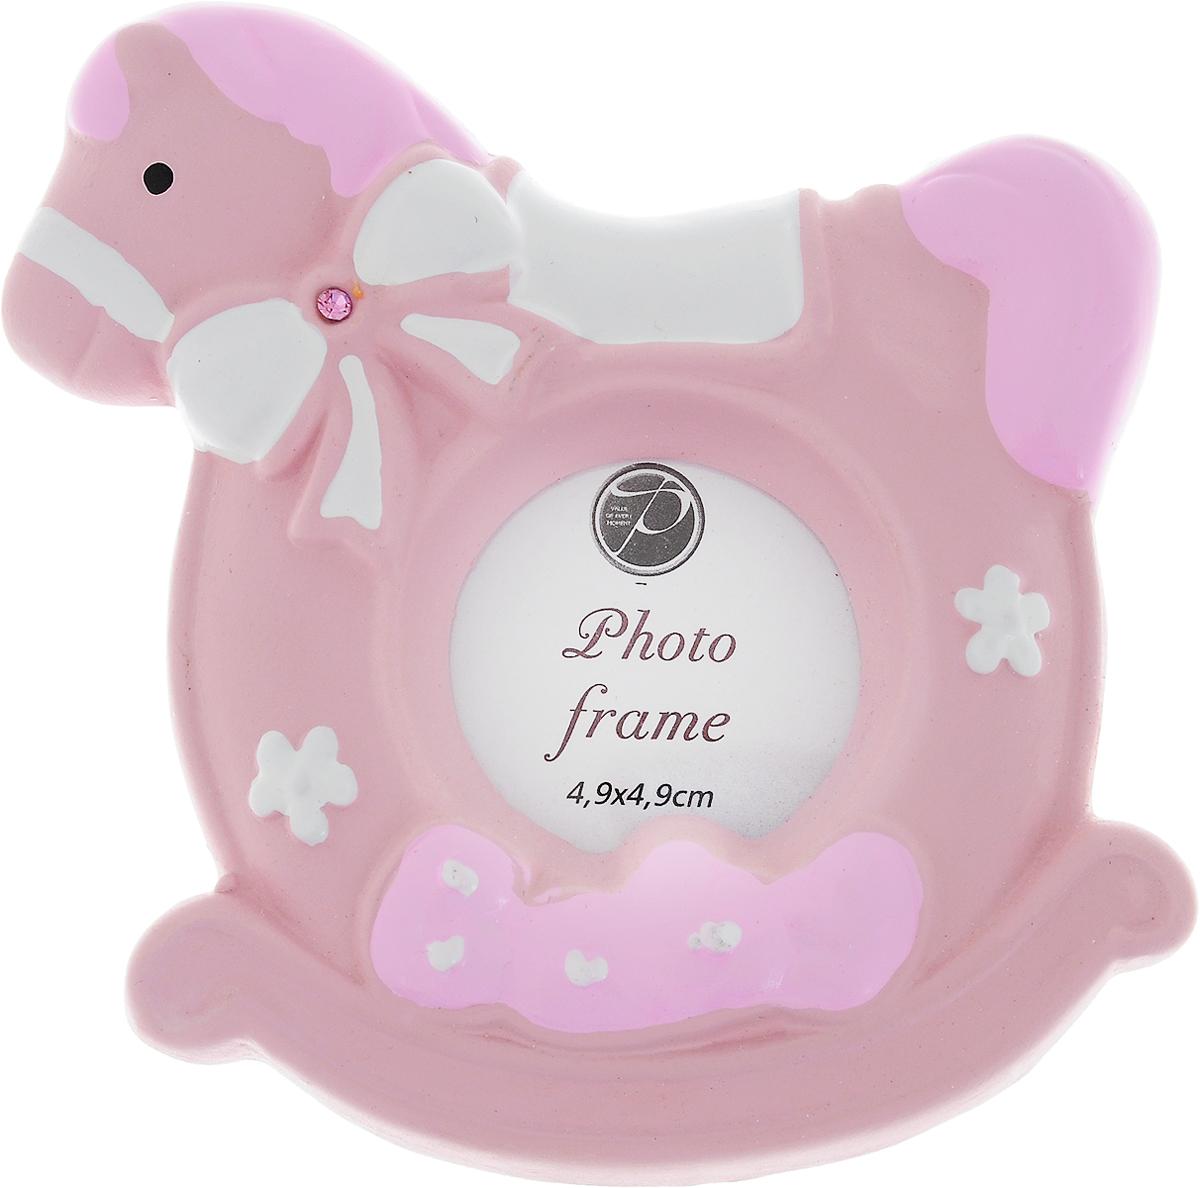 Фоторамка Pioneer, цвет: розовый, 4,9 х 4,9 см фоторамка pioneer viola 21 х 30 см